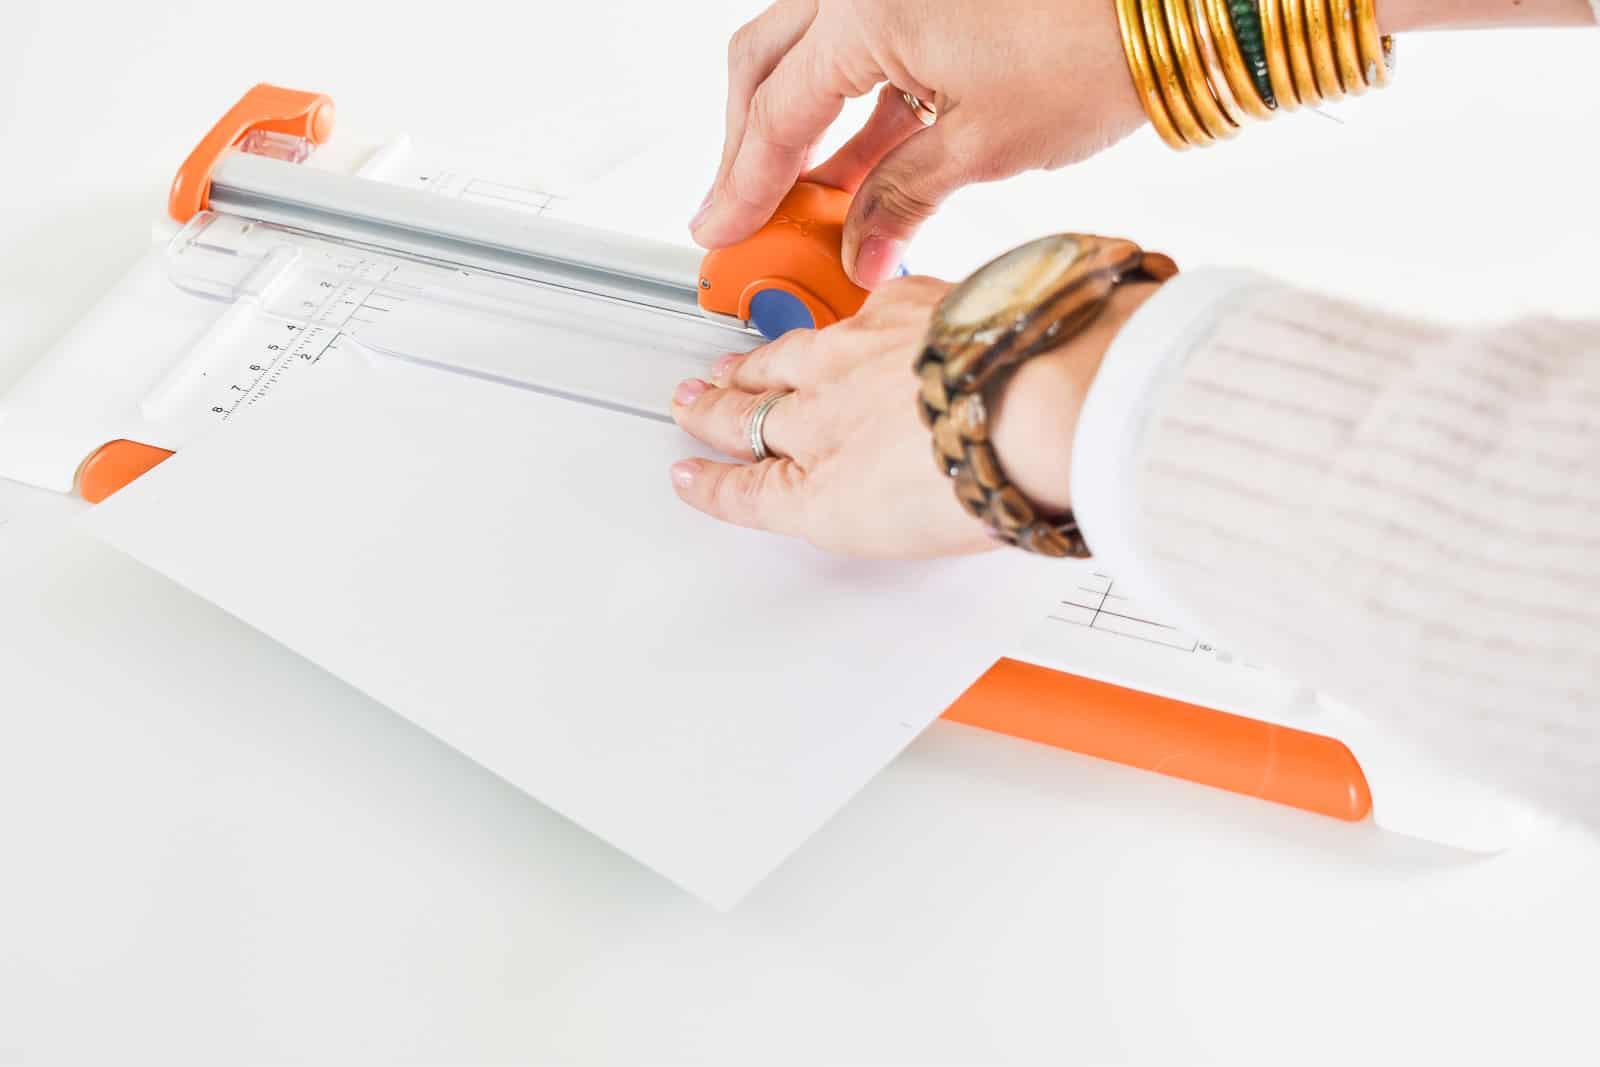 use paper cutter to cut triangles